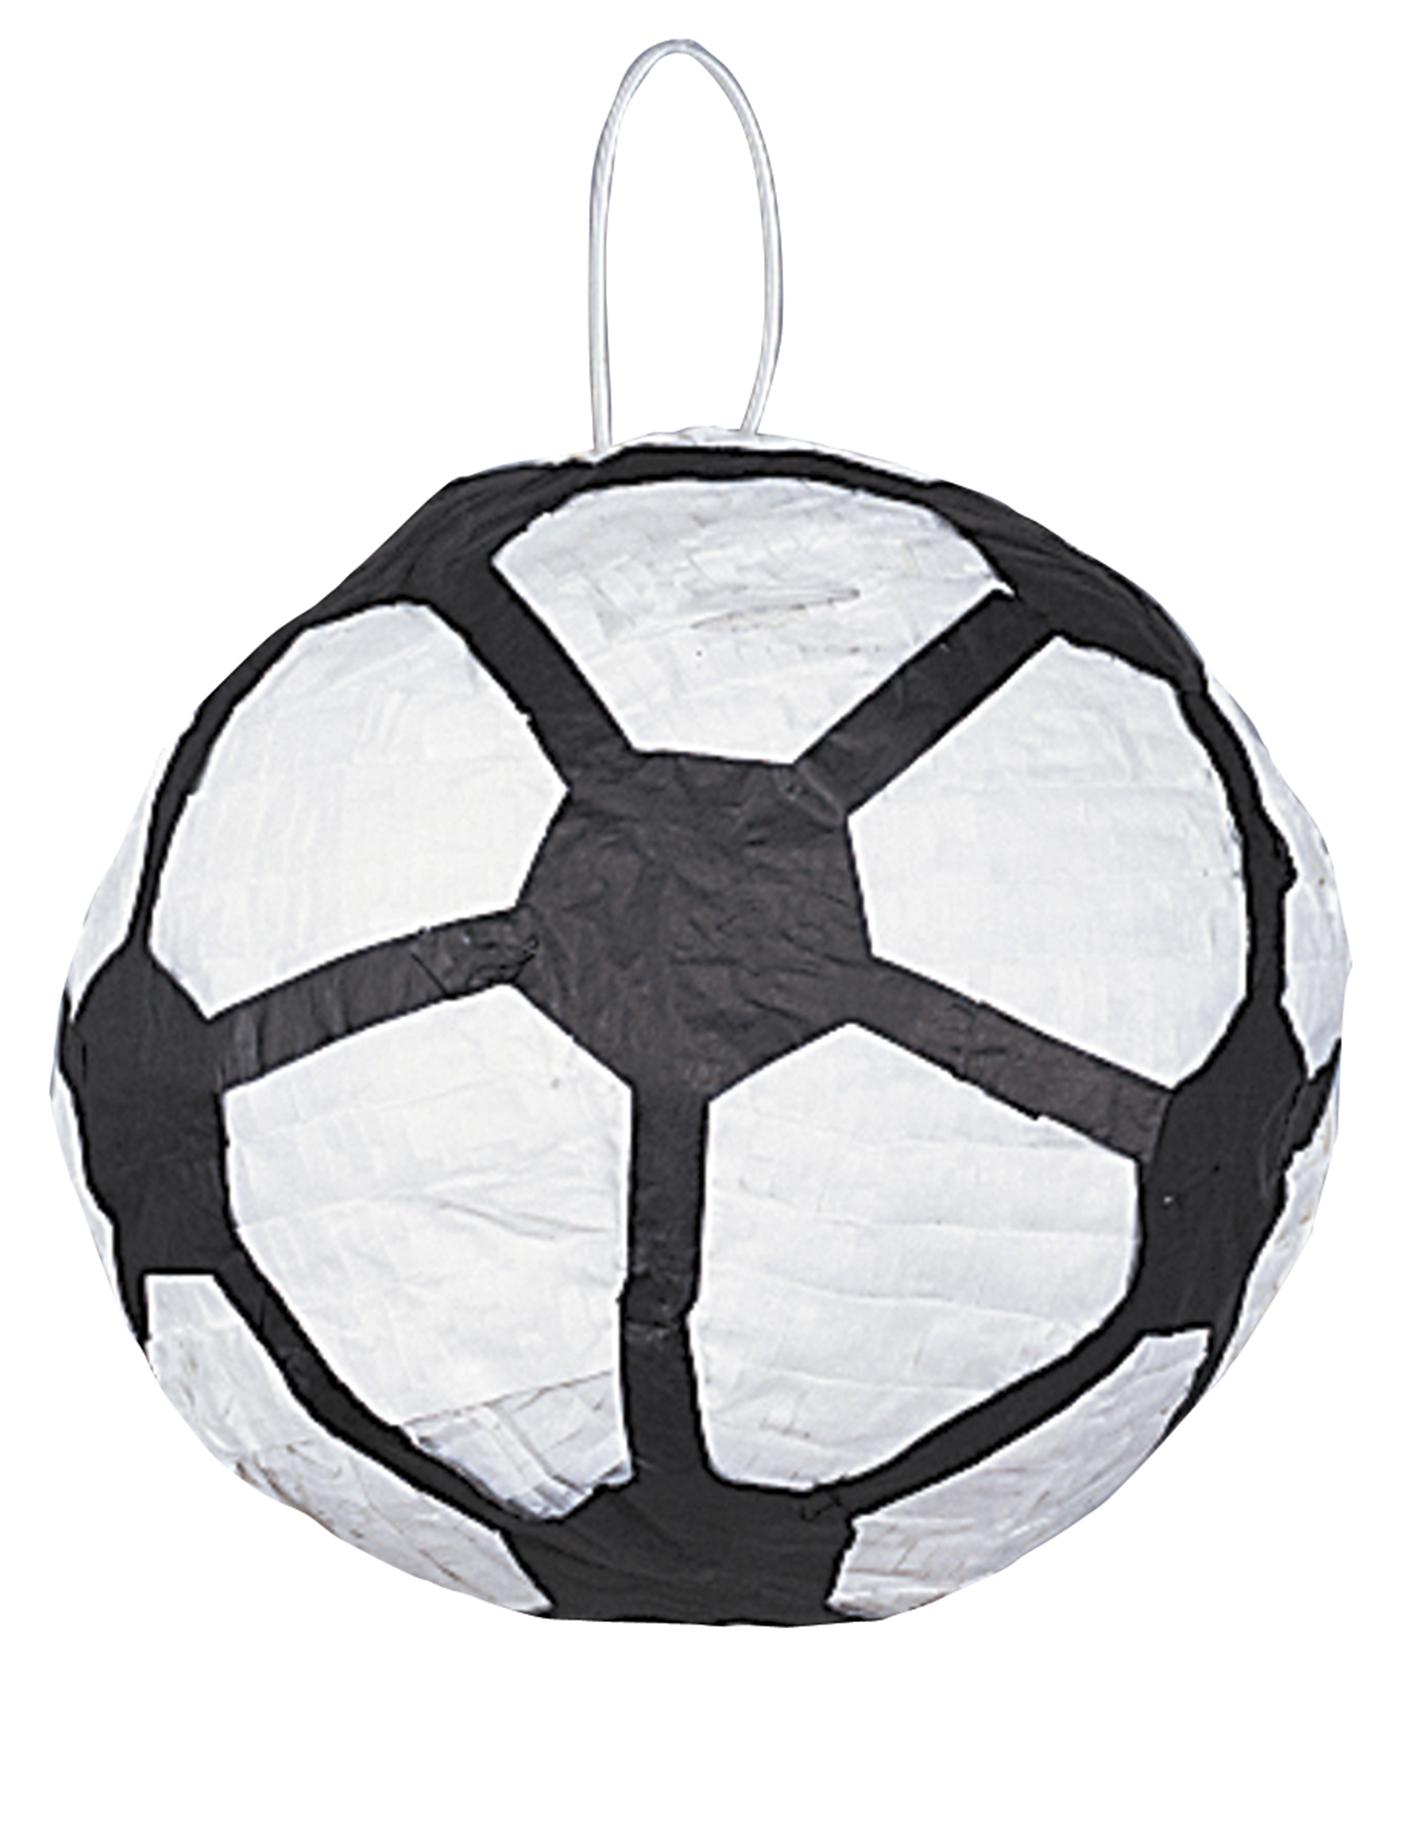 Pinhata 3D Bola Futebol